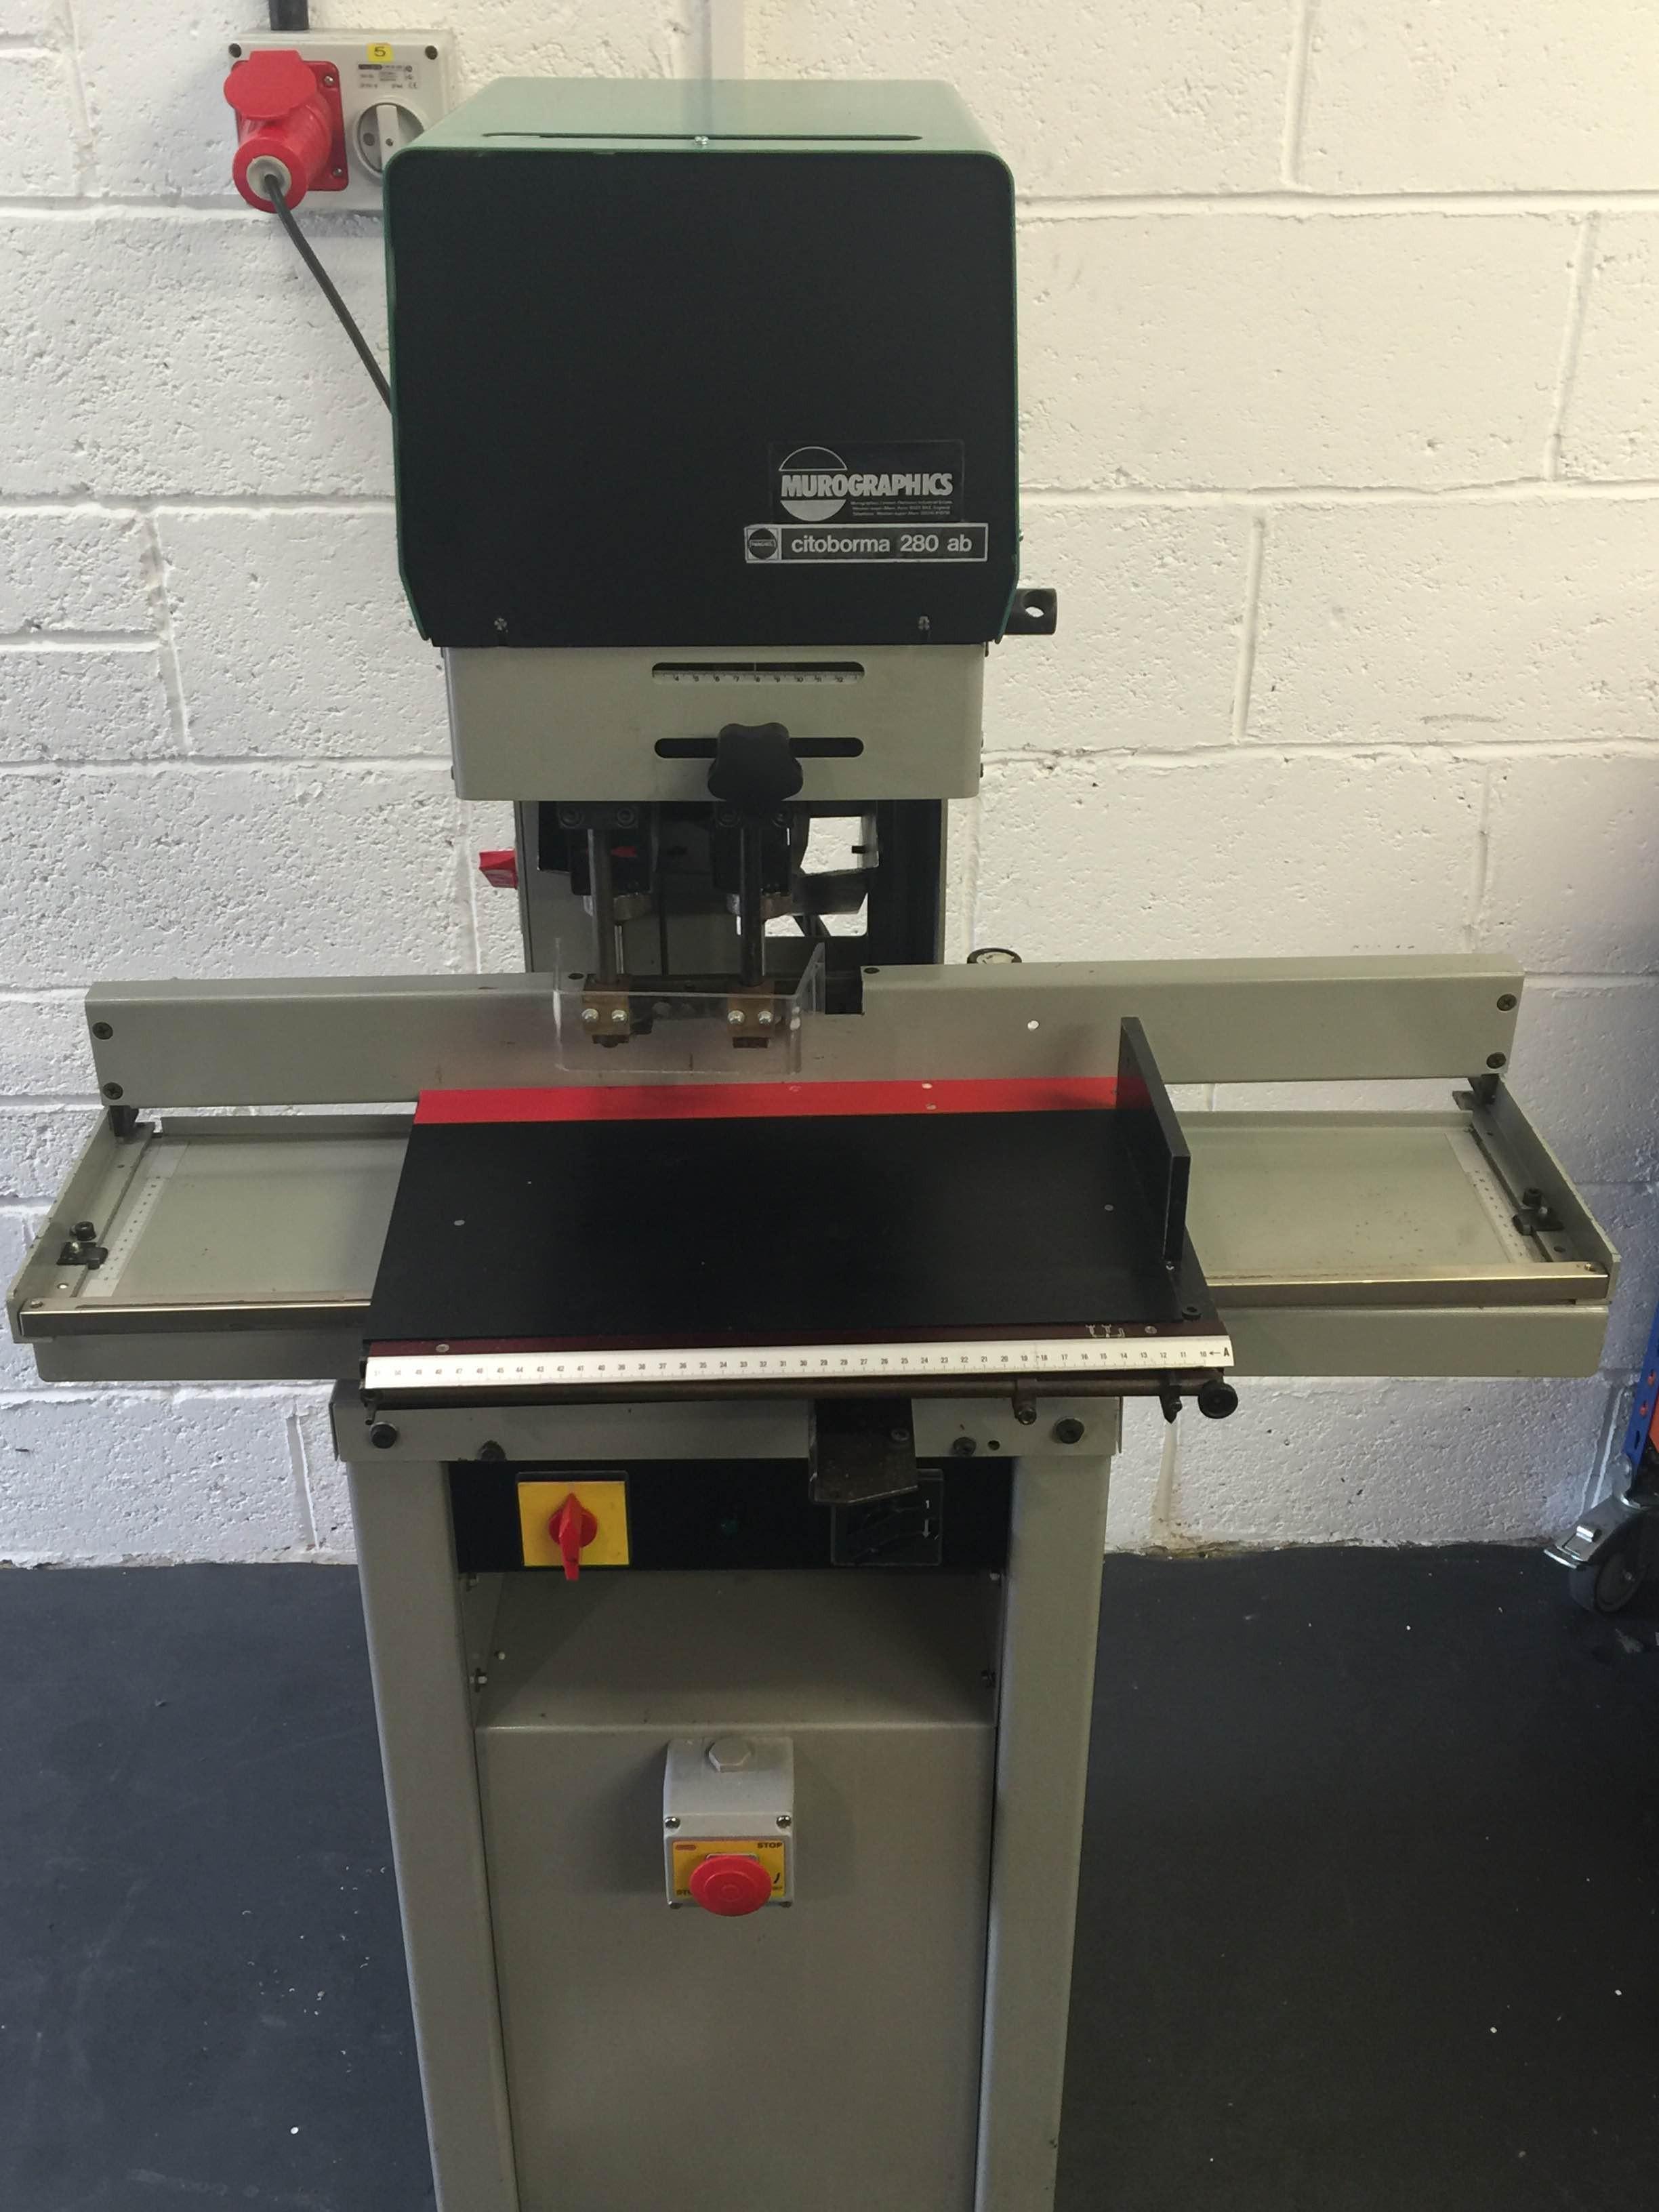 Used Nagel Citoborma 280 Ab Paper Drill Binding Store